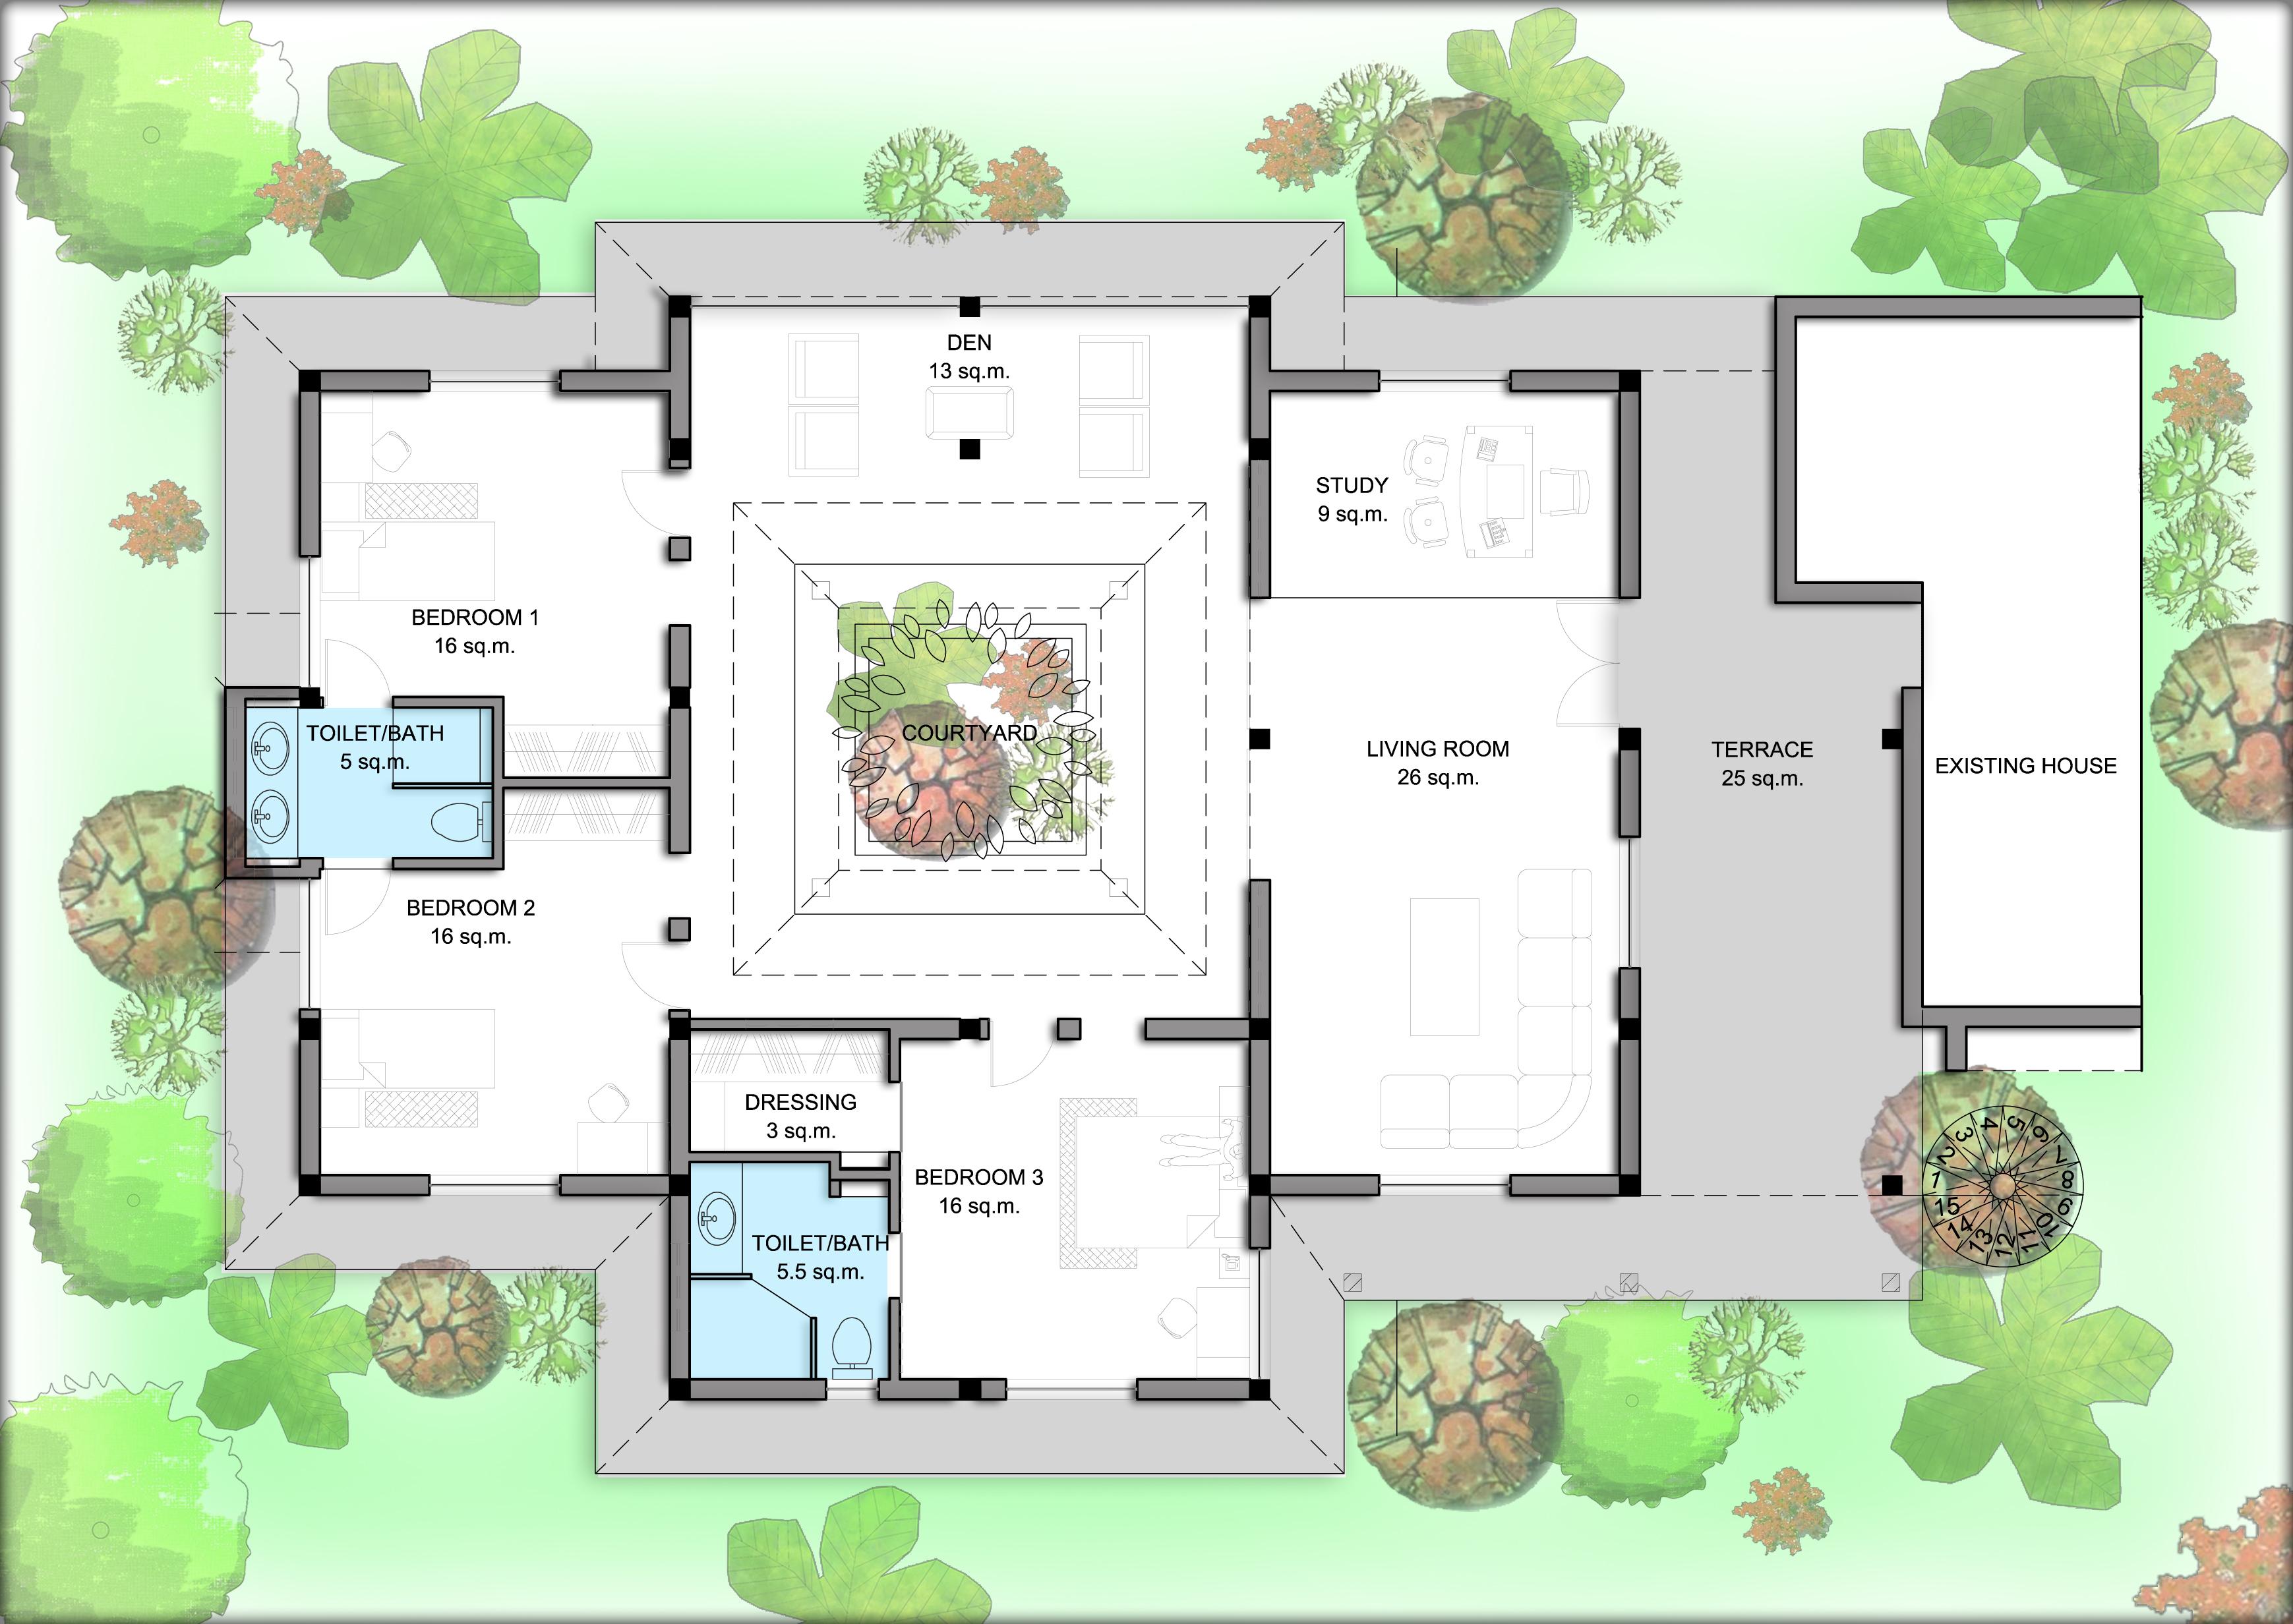 Fraternity house floor plans - House interior